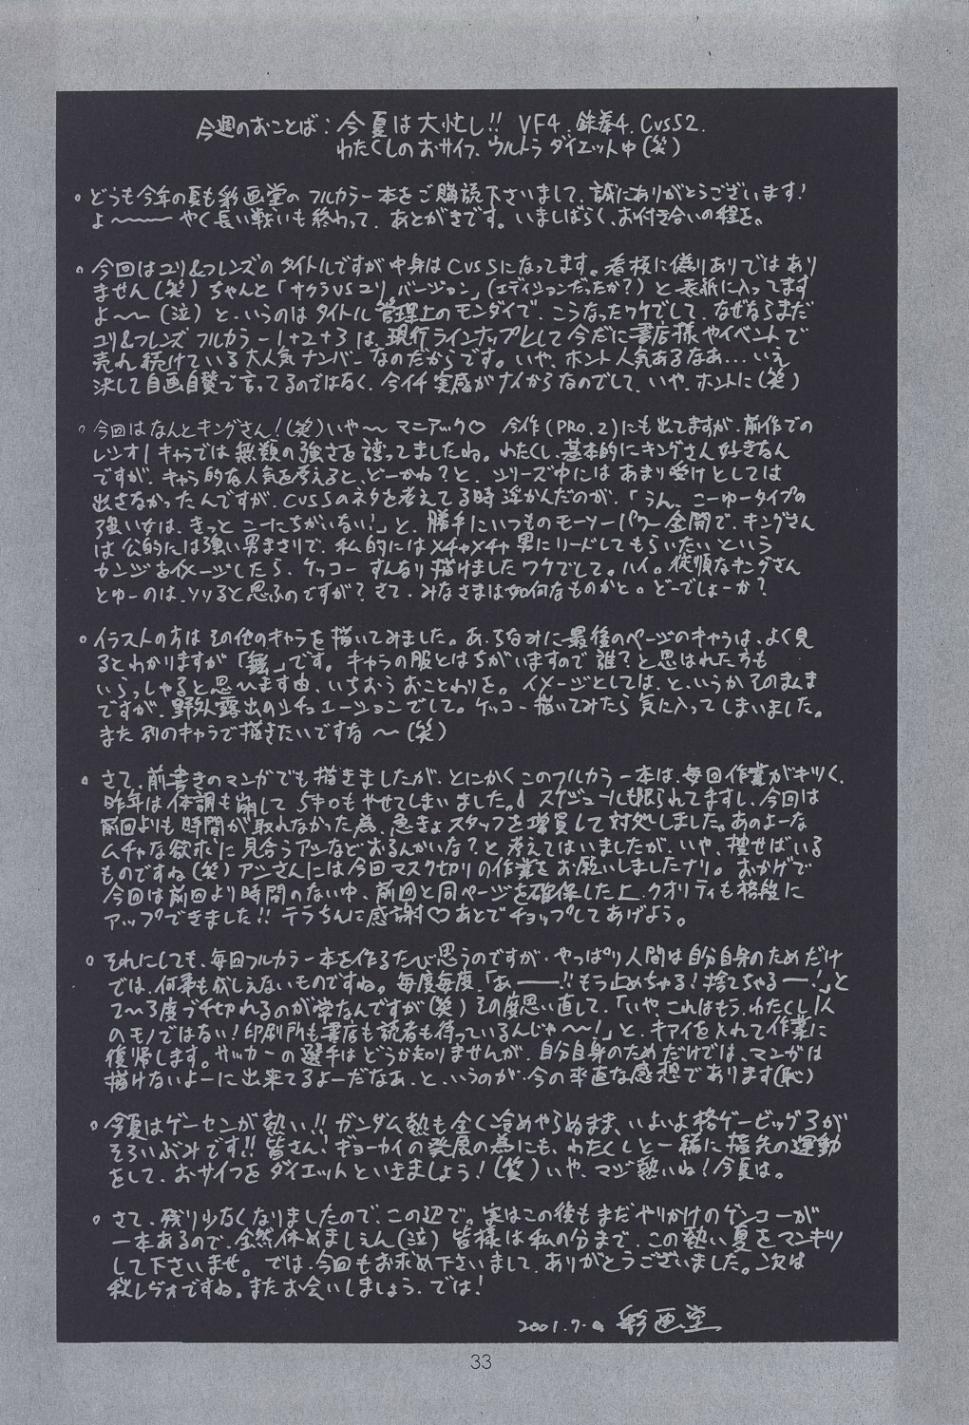 The Yuri & Friends Fullcolor 4 SAKURA vs. YURI EDITION 31